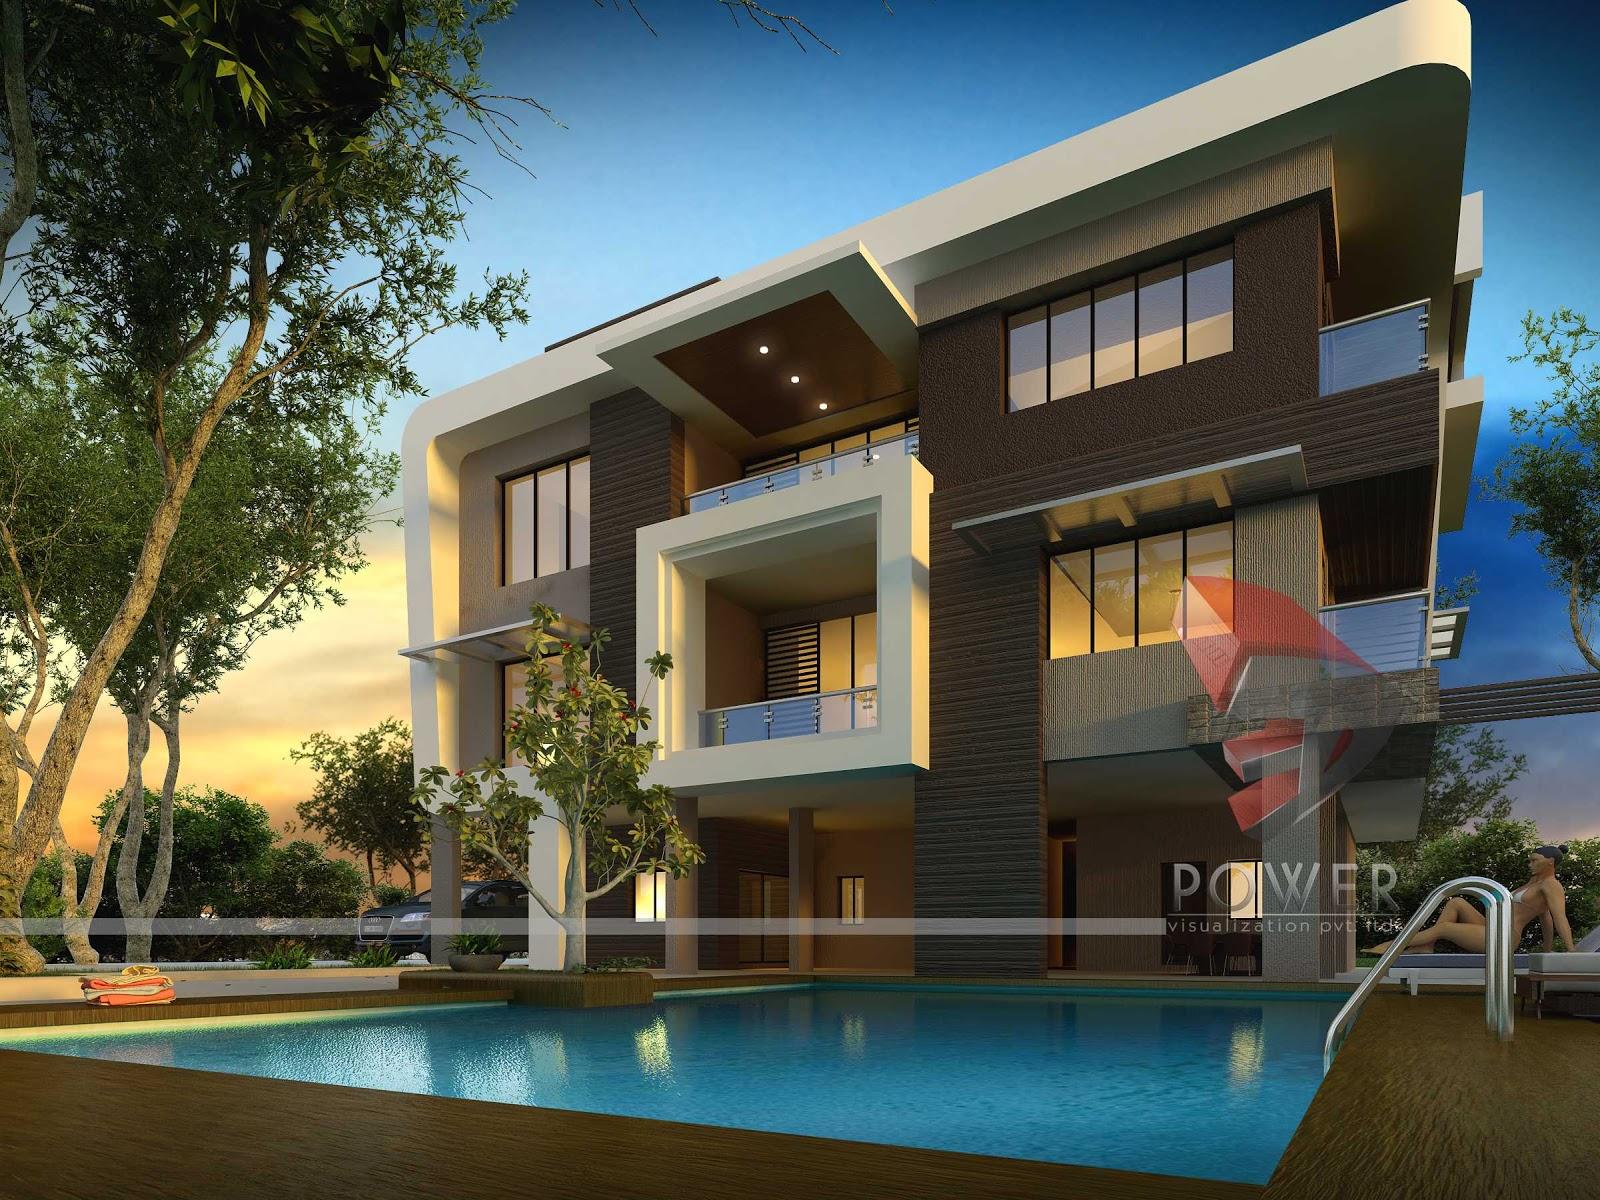 Ultra Modern Home Designs October 2012